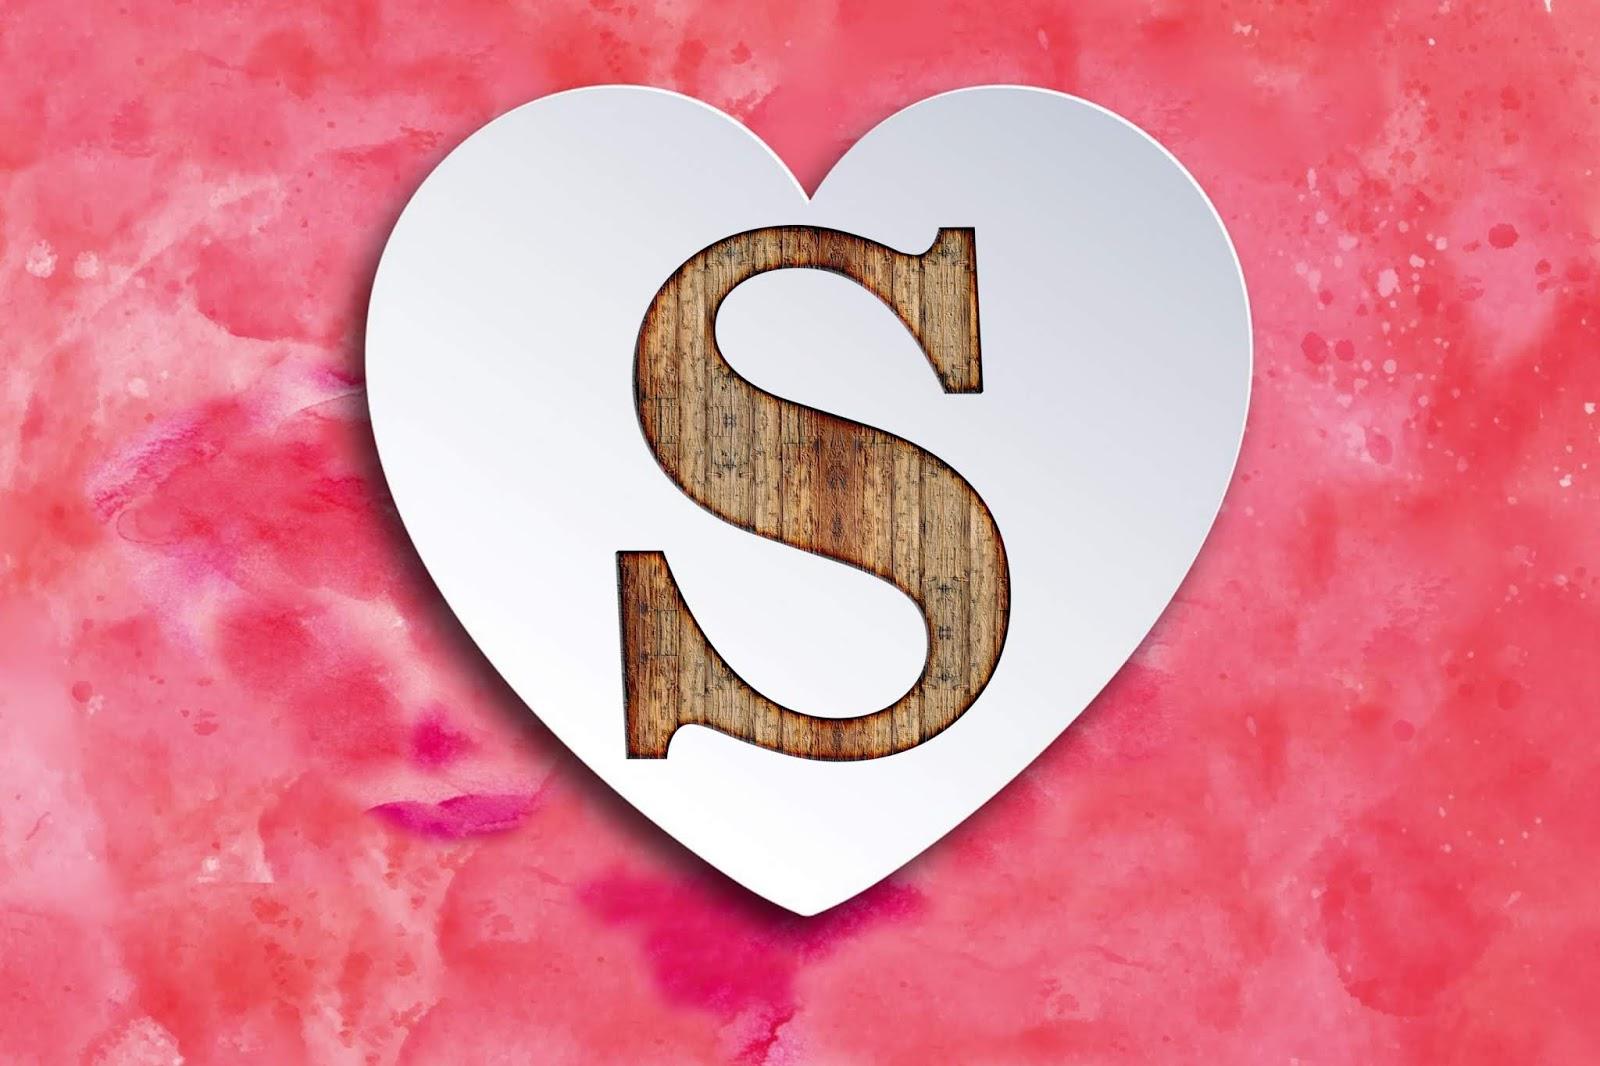 S Image Love Photo Wallpaper Picture Pic